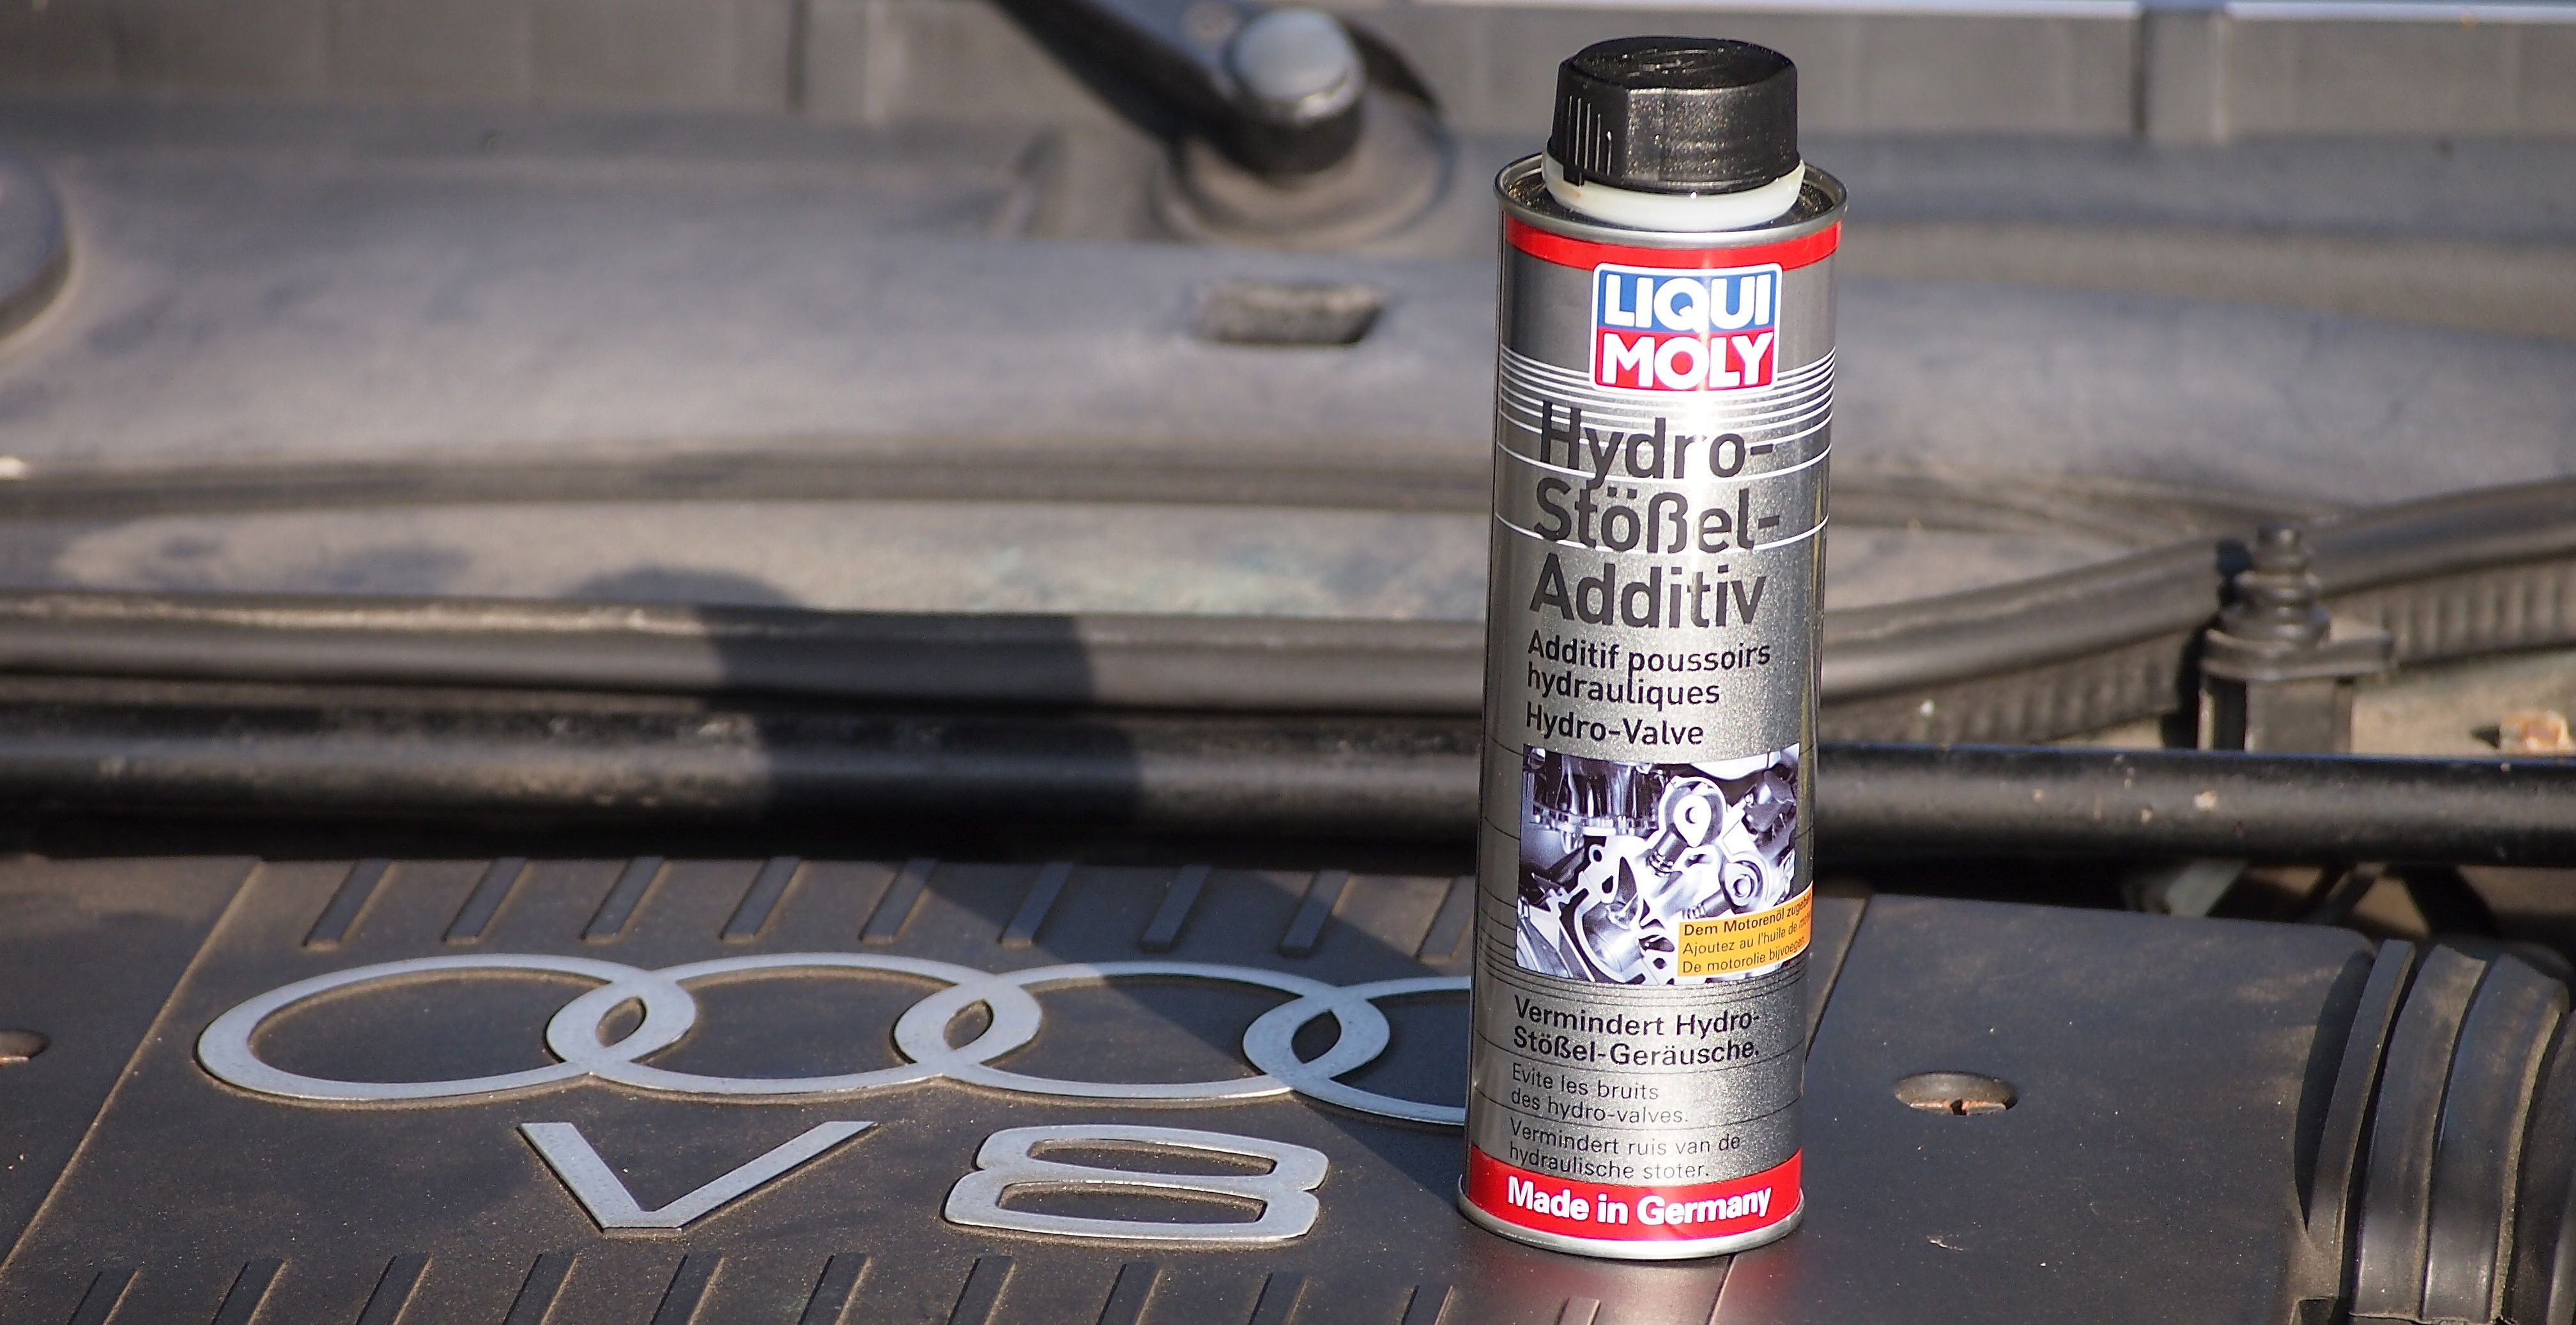 Hydrostößel liqui moly